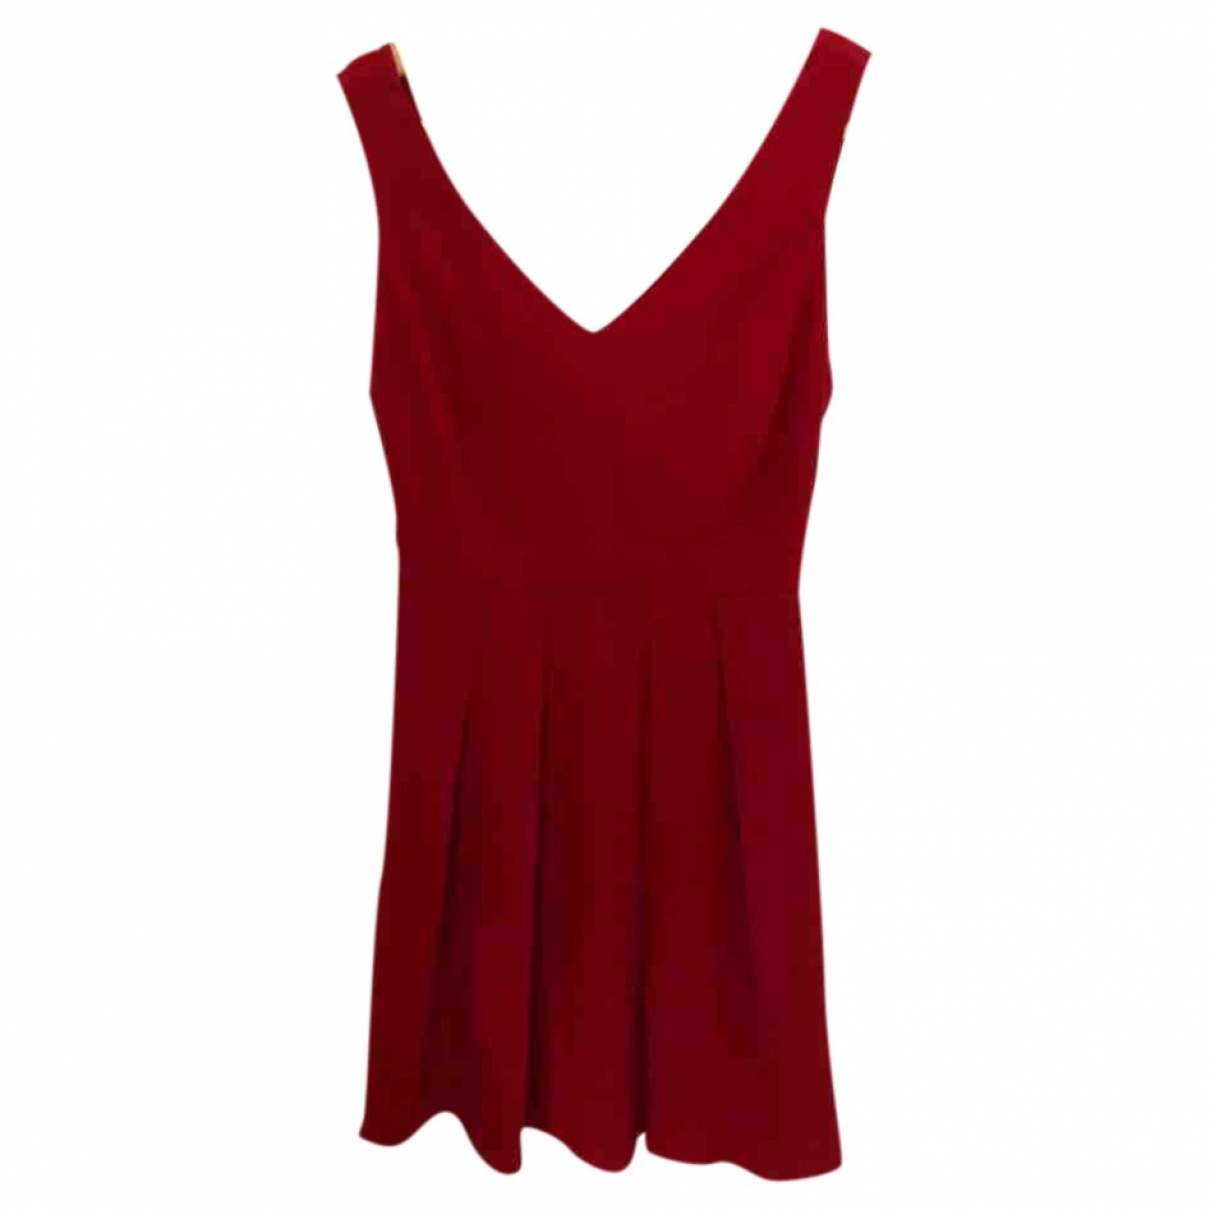 Claudie Pierlot \N Red dress for Women 36 FR